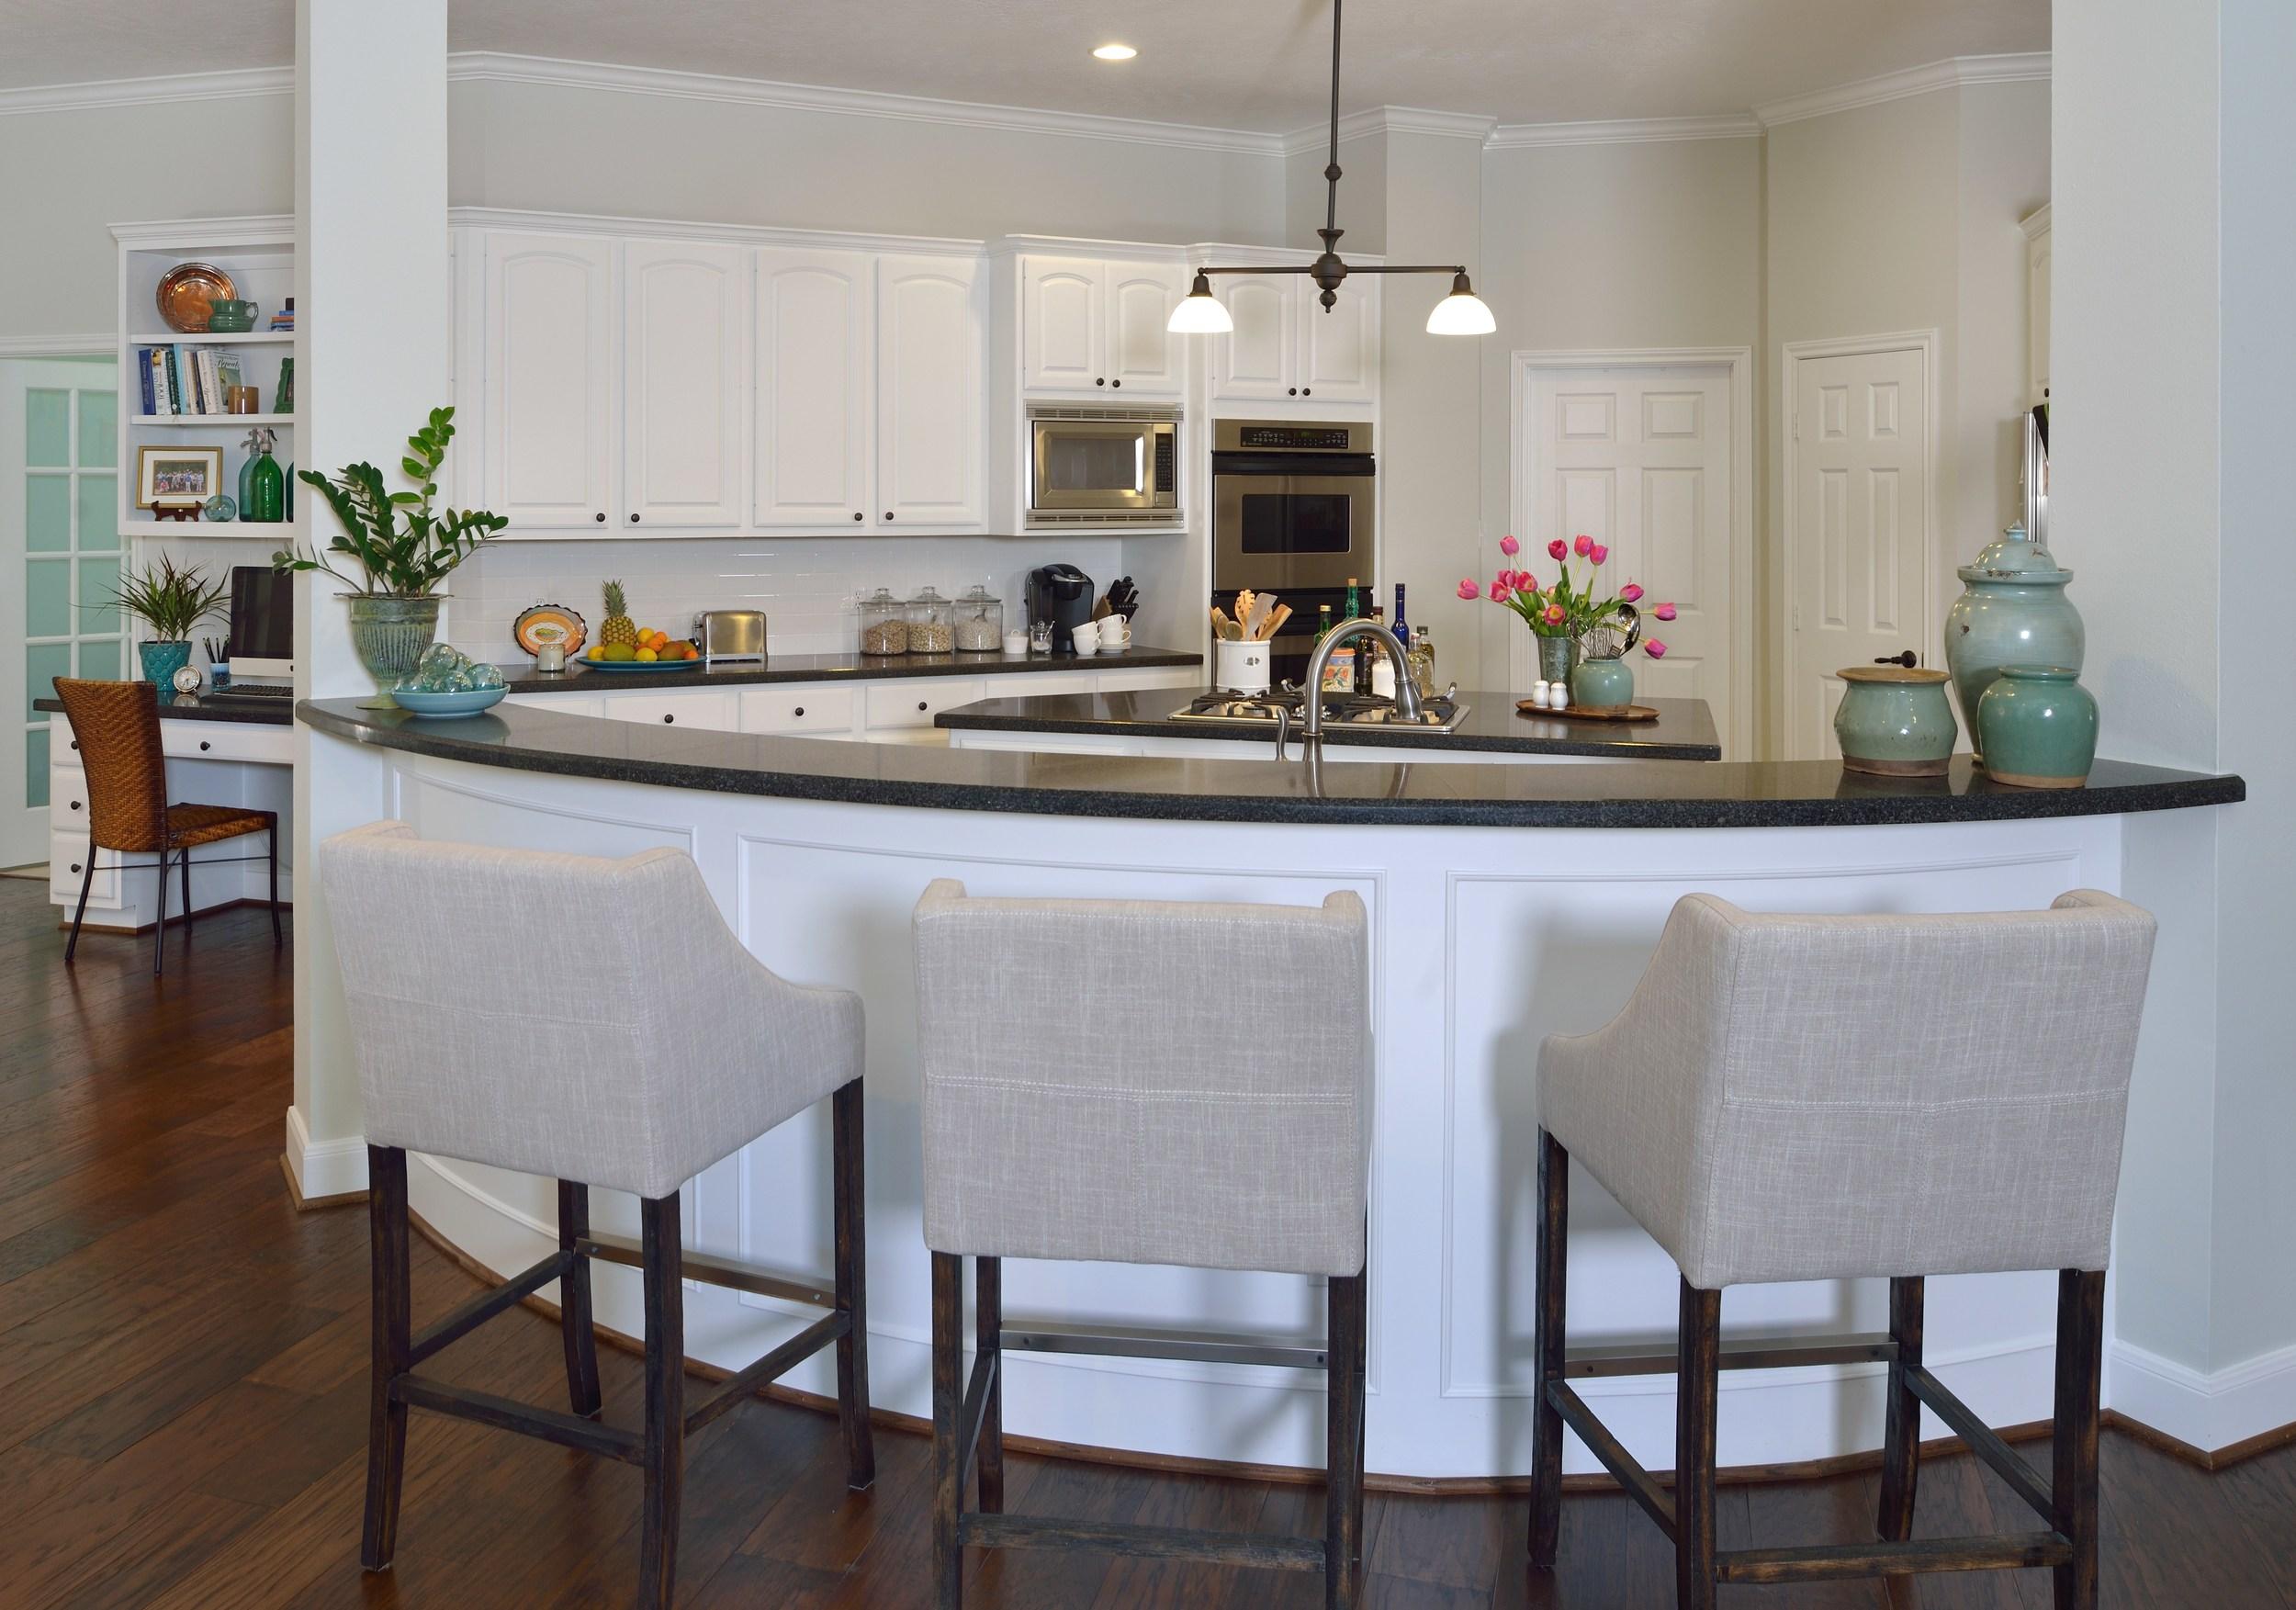 White kitchen with linen covered barstools, Designer: Carla Aston